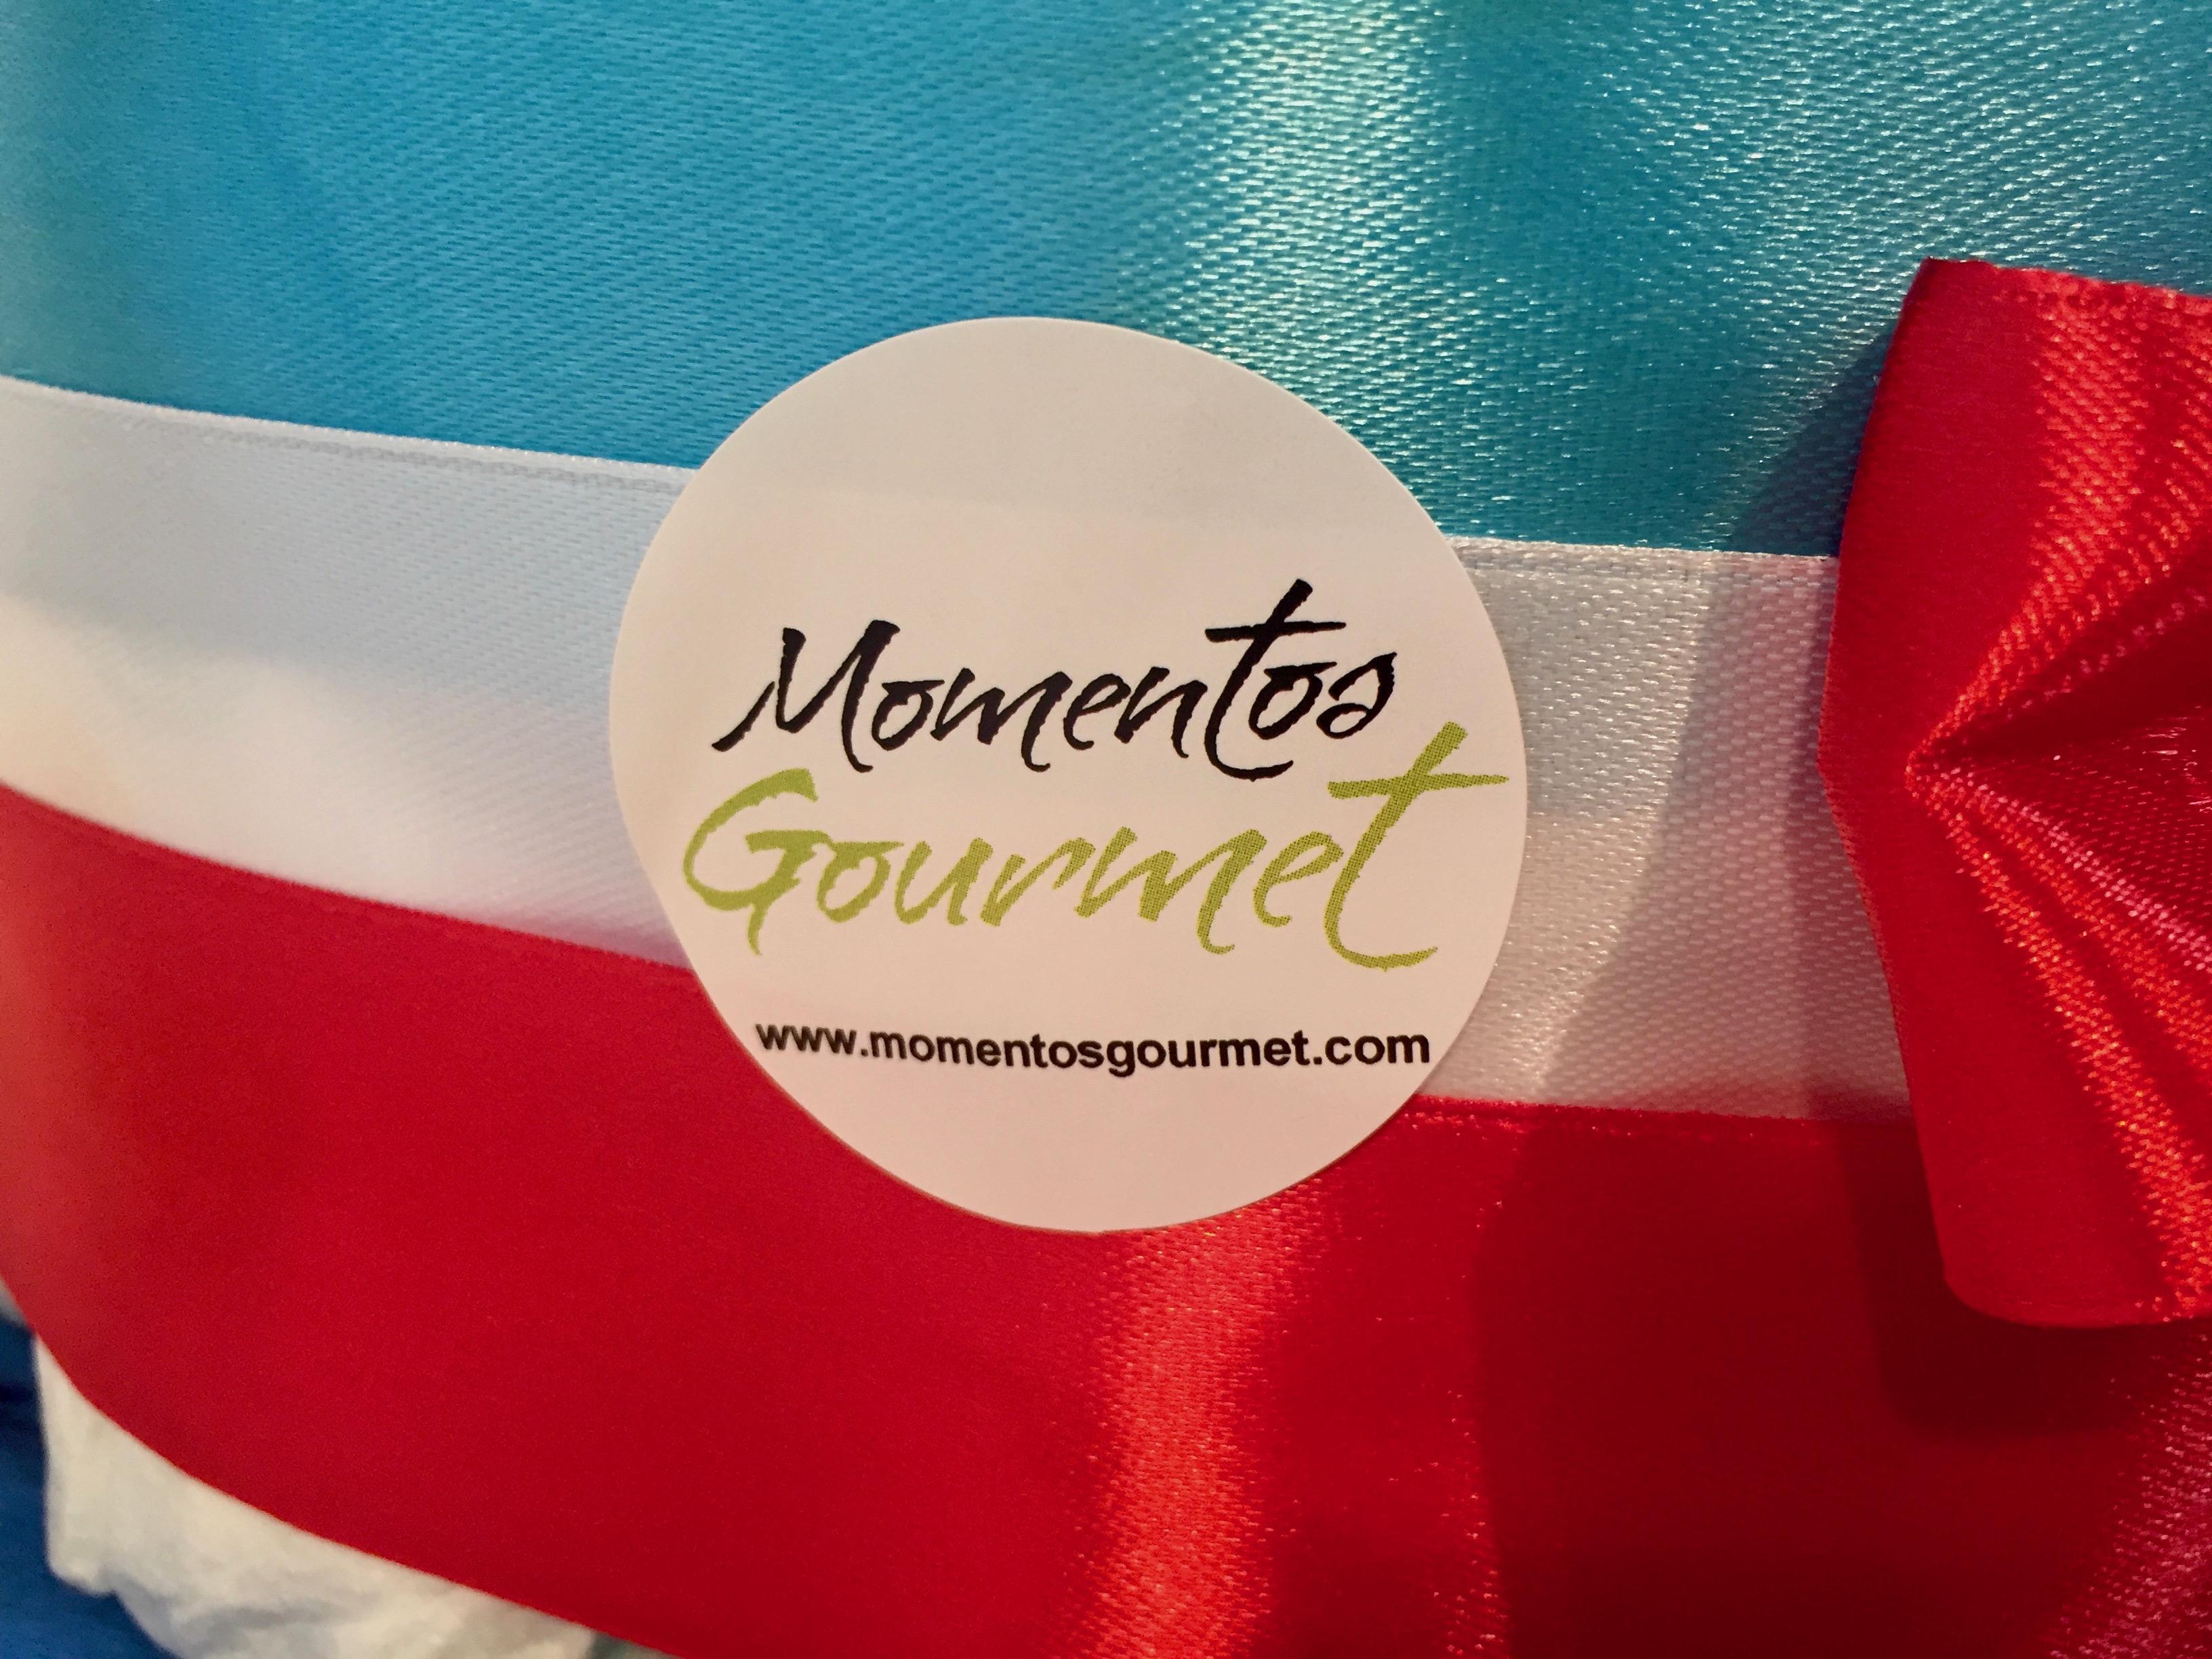 Logo-MomentosGourmet-rojo-blanco-azul